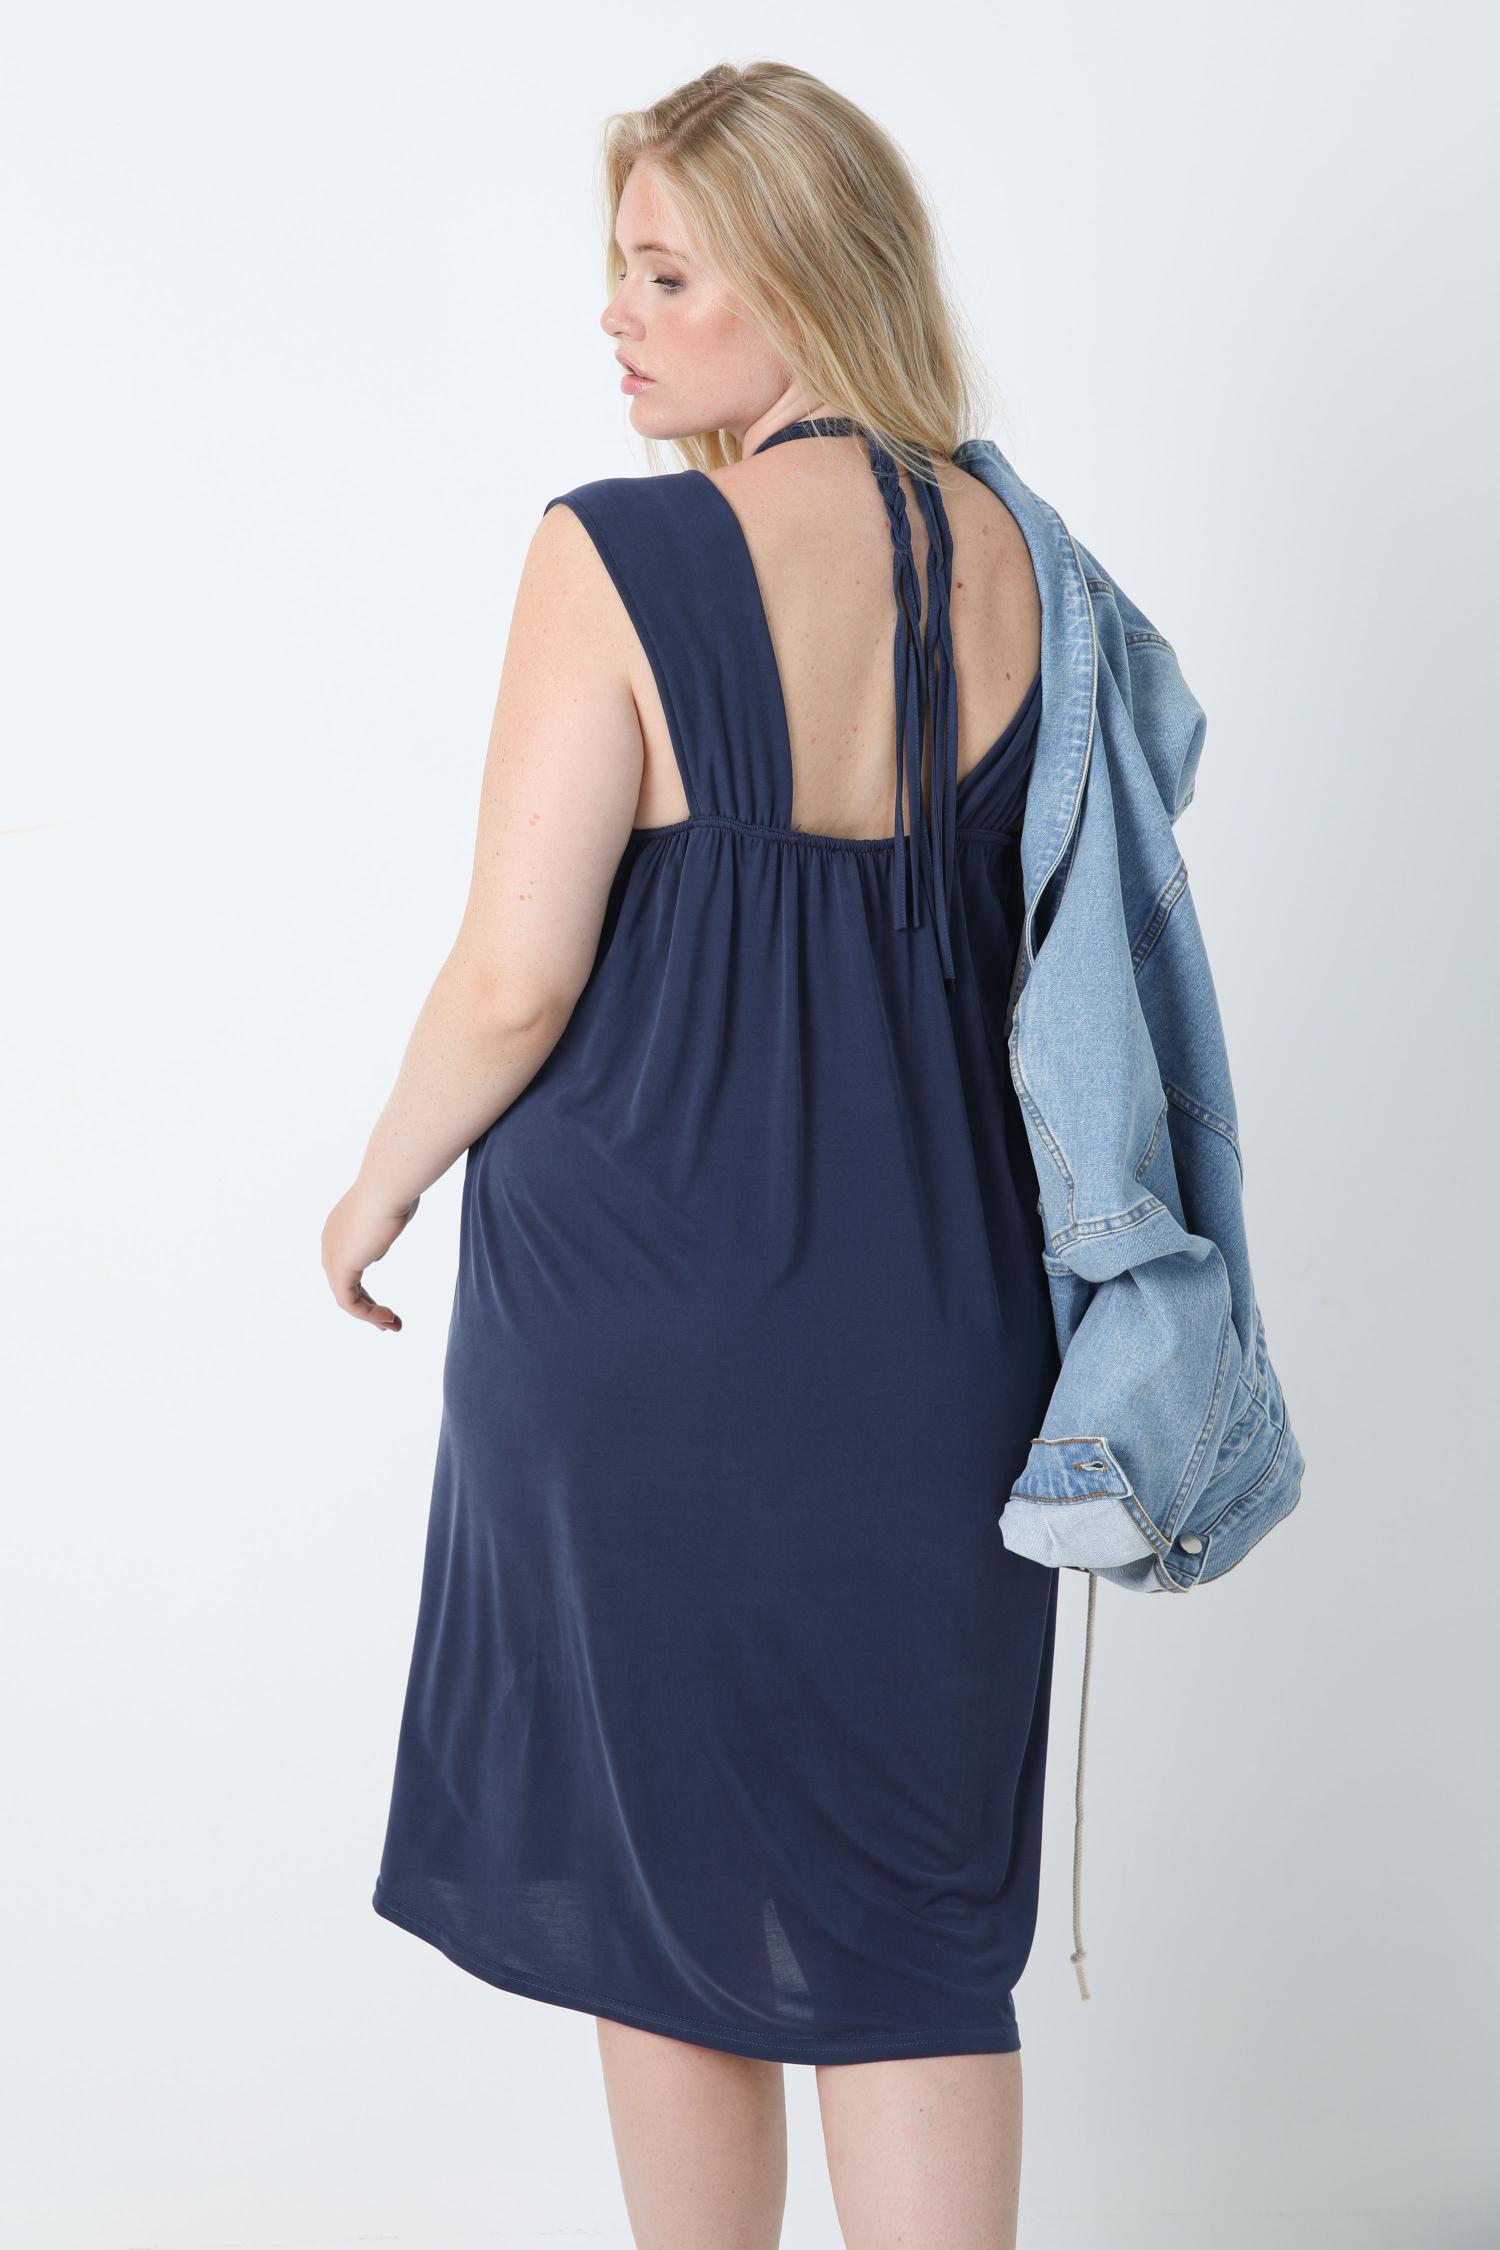 Sleeveless mid-length modal dress